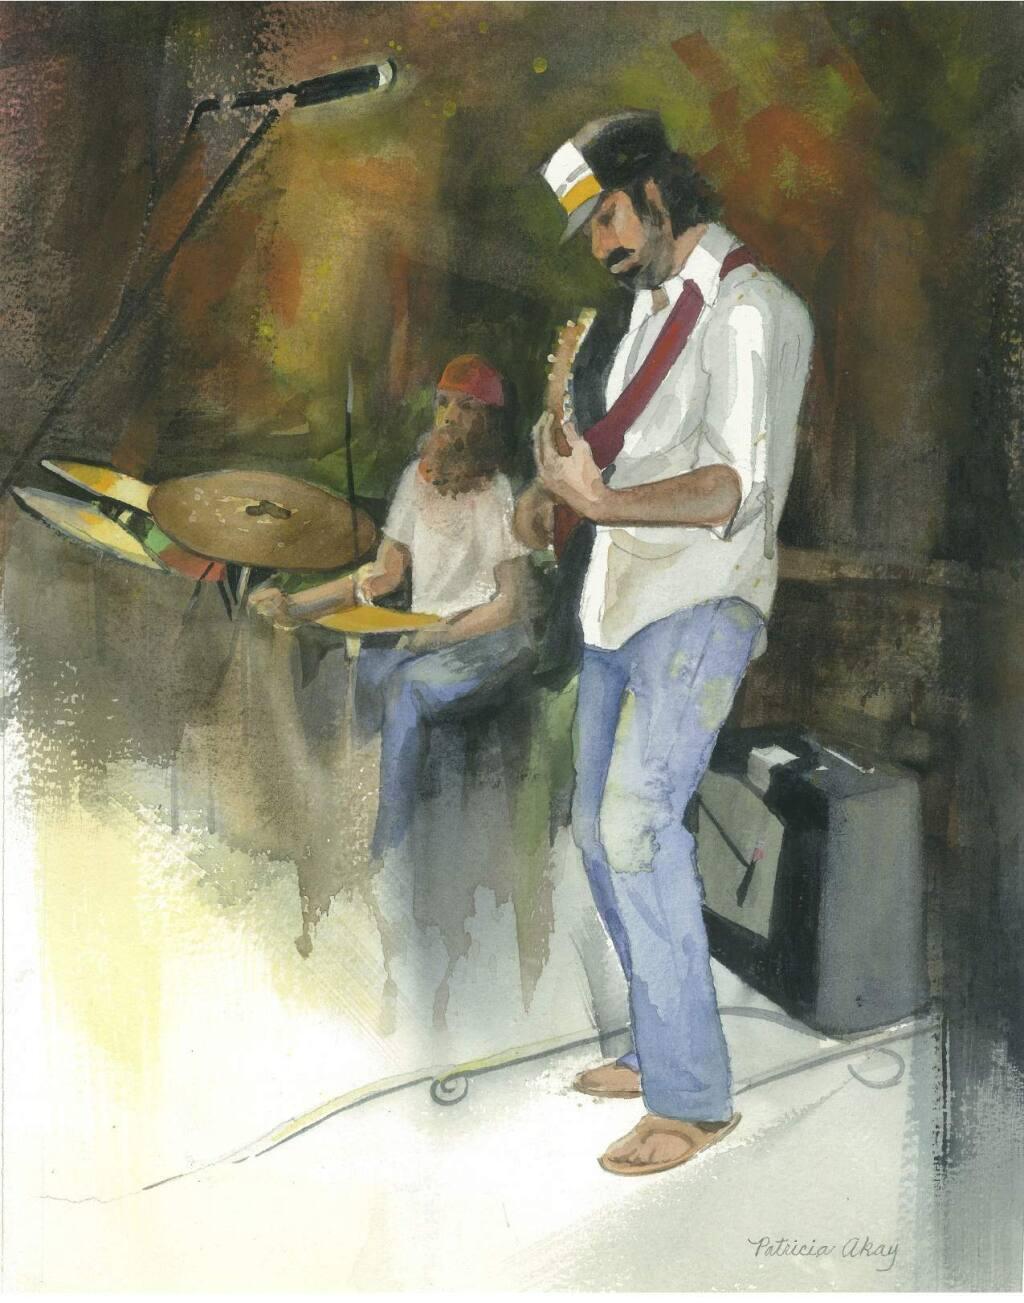 Patricia Akay's watercolor rendering of musician Brian Rashap at Terrapin Crossroads in San Rafael earned the President's Award in the Aqua Areas Juried Show.